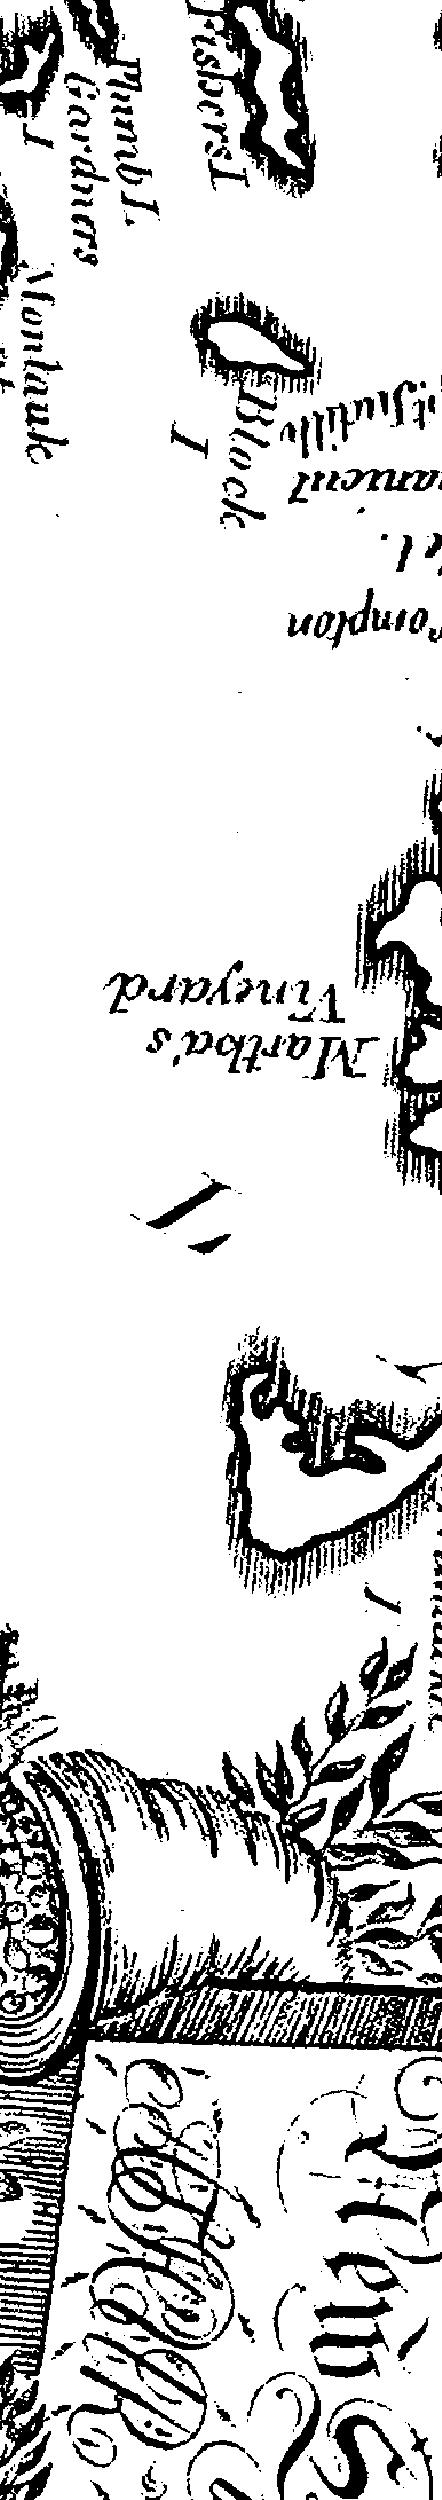 [subsumed][subsumed][subsumed][ocr errors][ocr errors][subsumed][ocr errors]